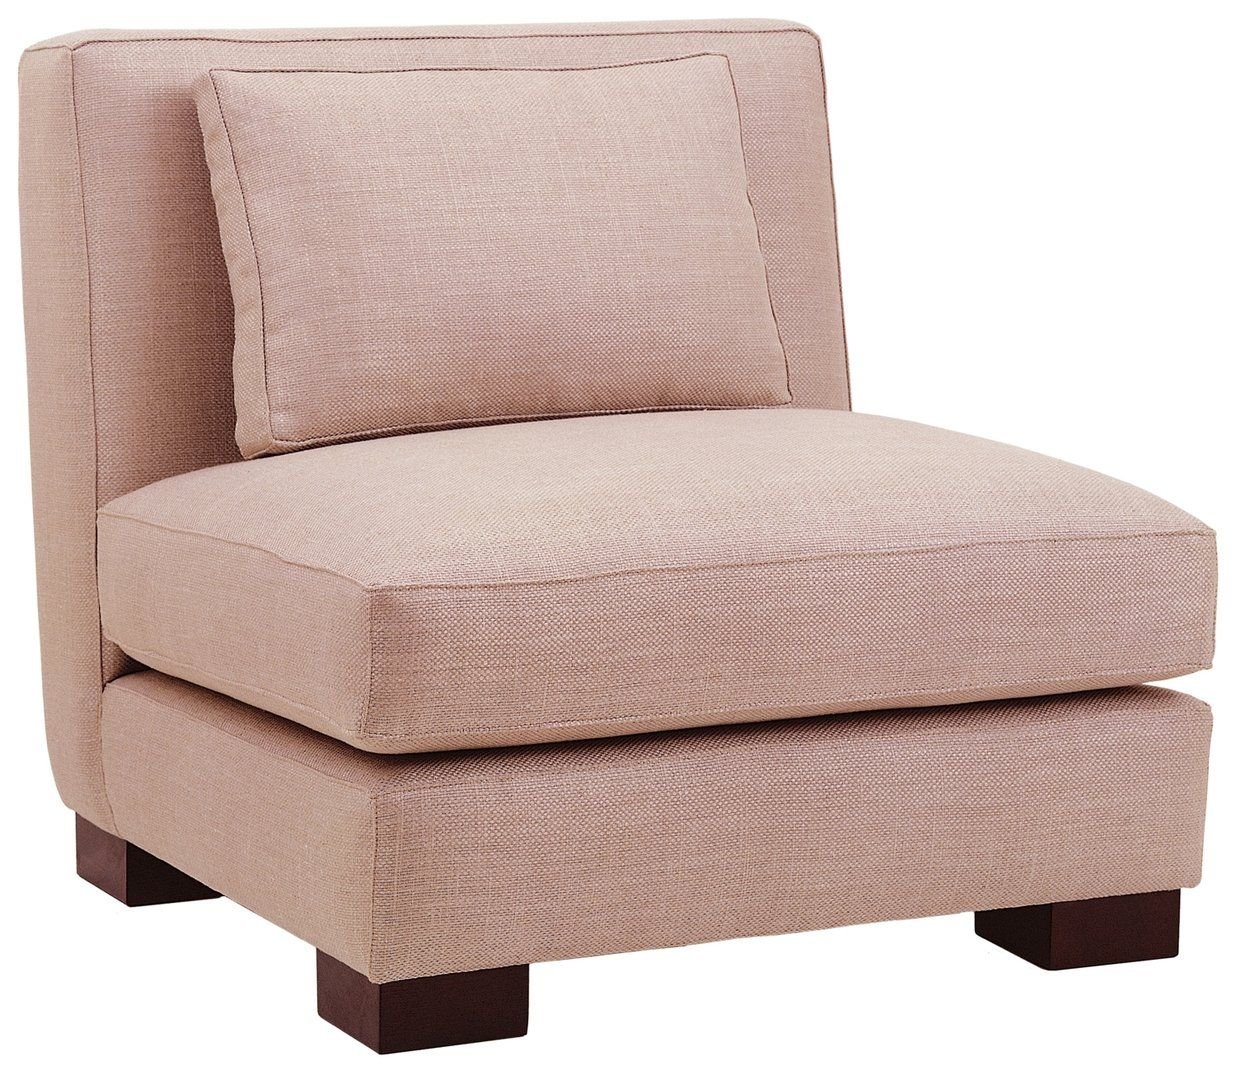 Butaca Moderna Sin Brazos Porto Demarques Es Furniture  # Muebles Butacas Modernas